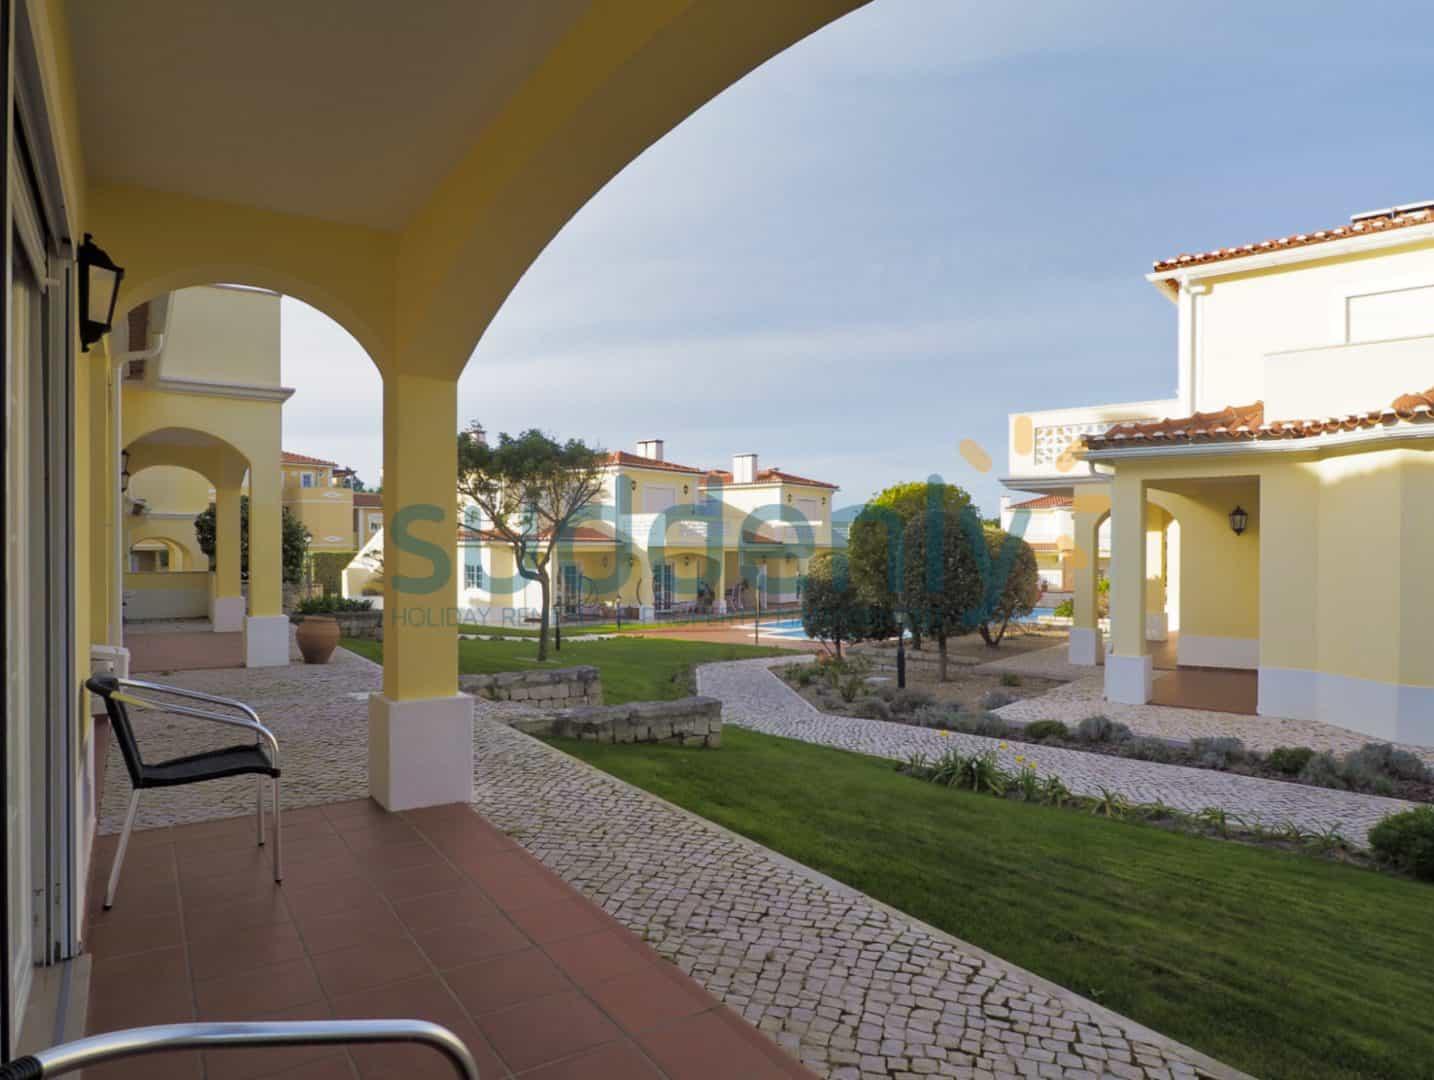 Villas 274